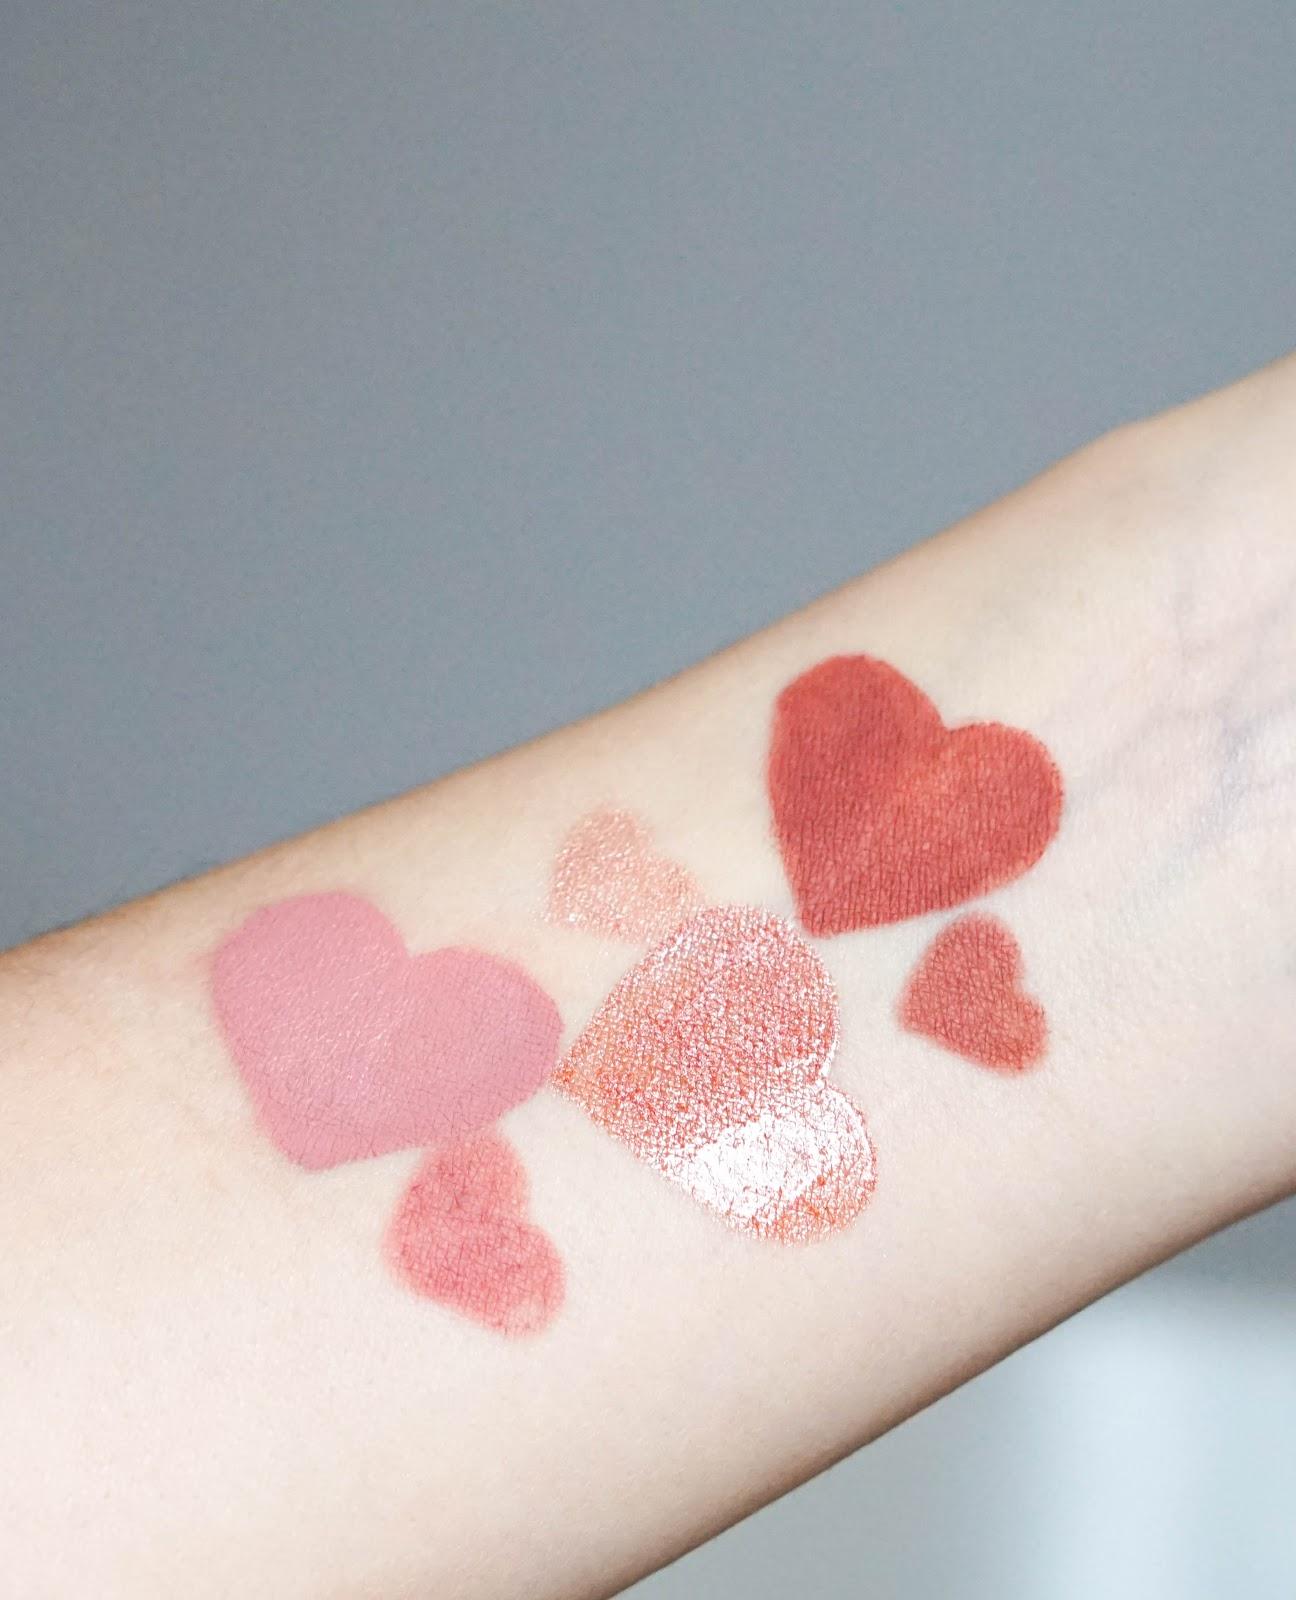 Lottie London, Makeup Revolution & Barry M